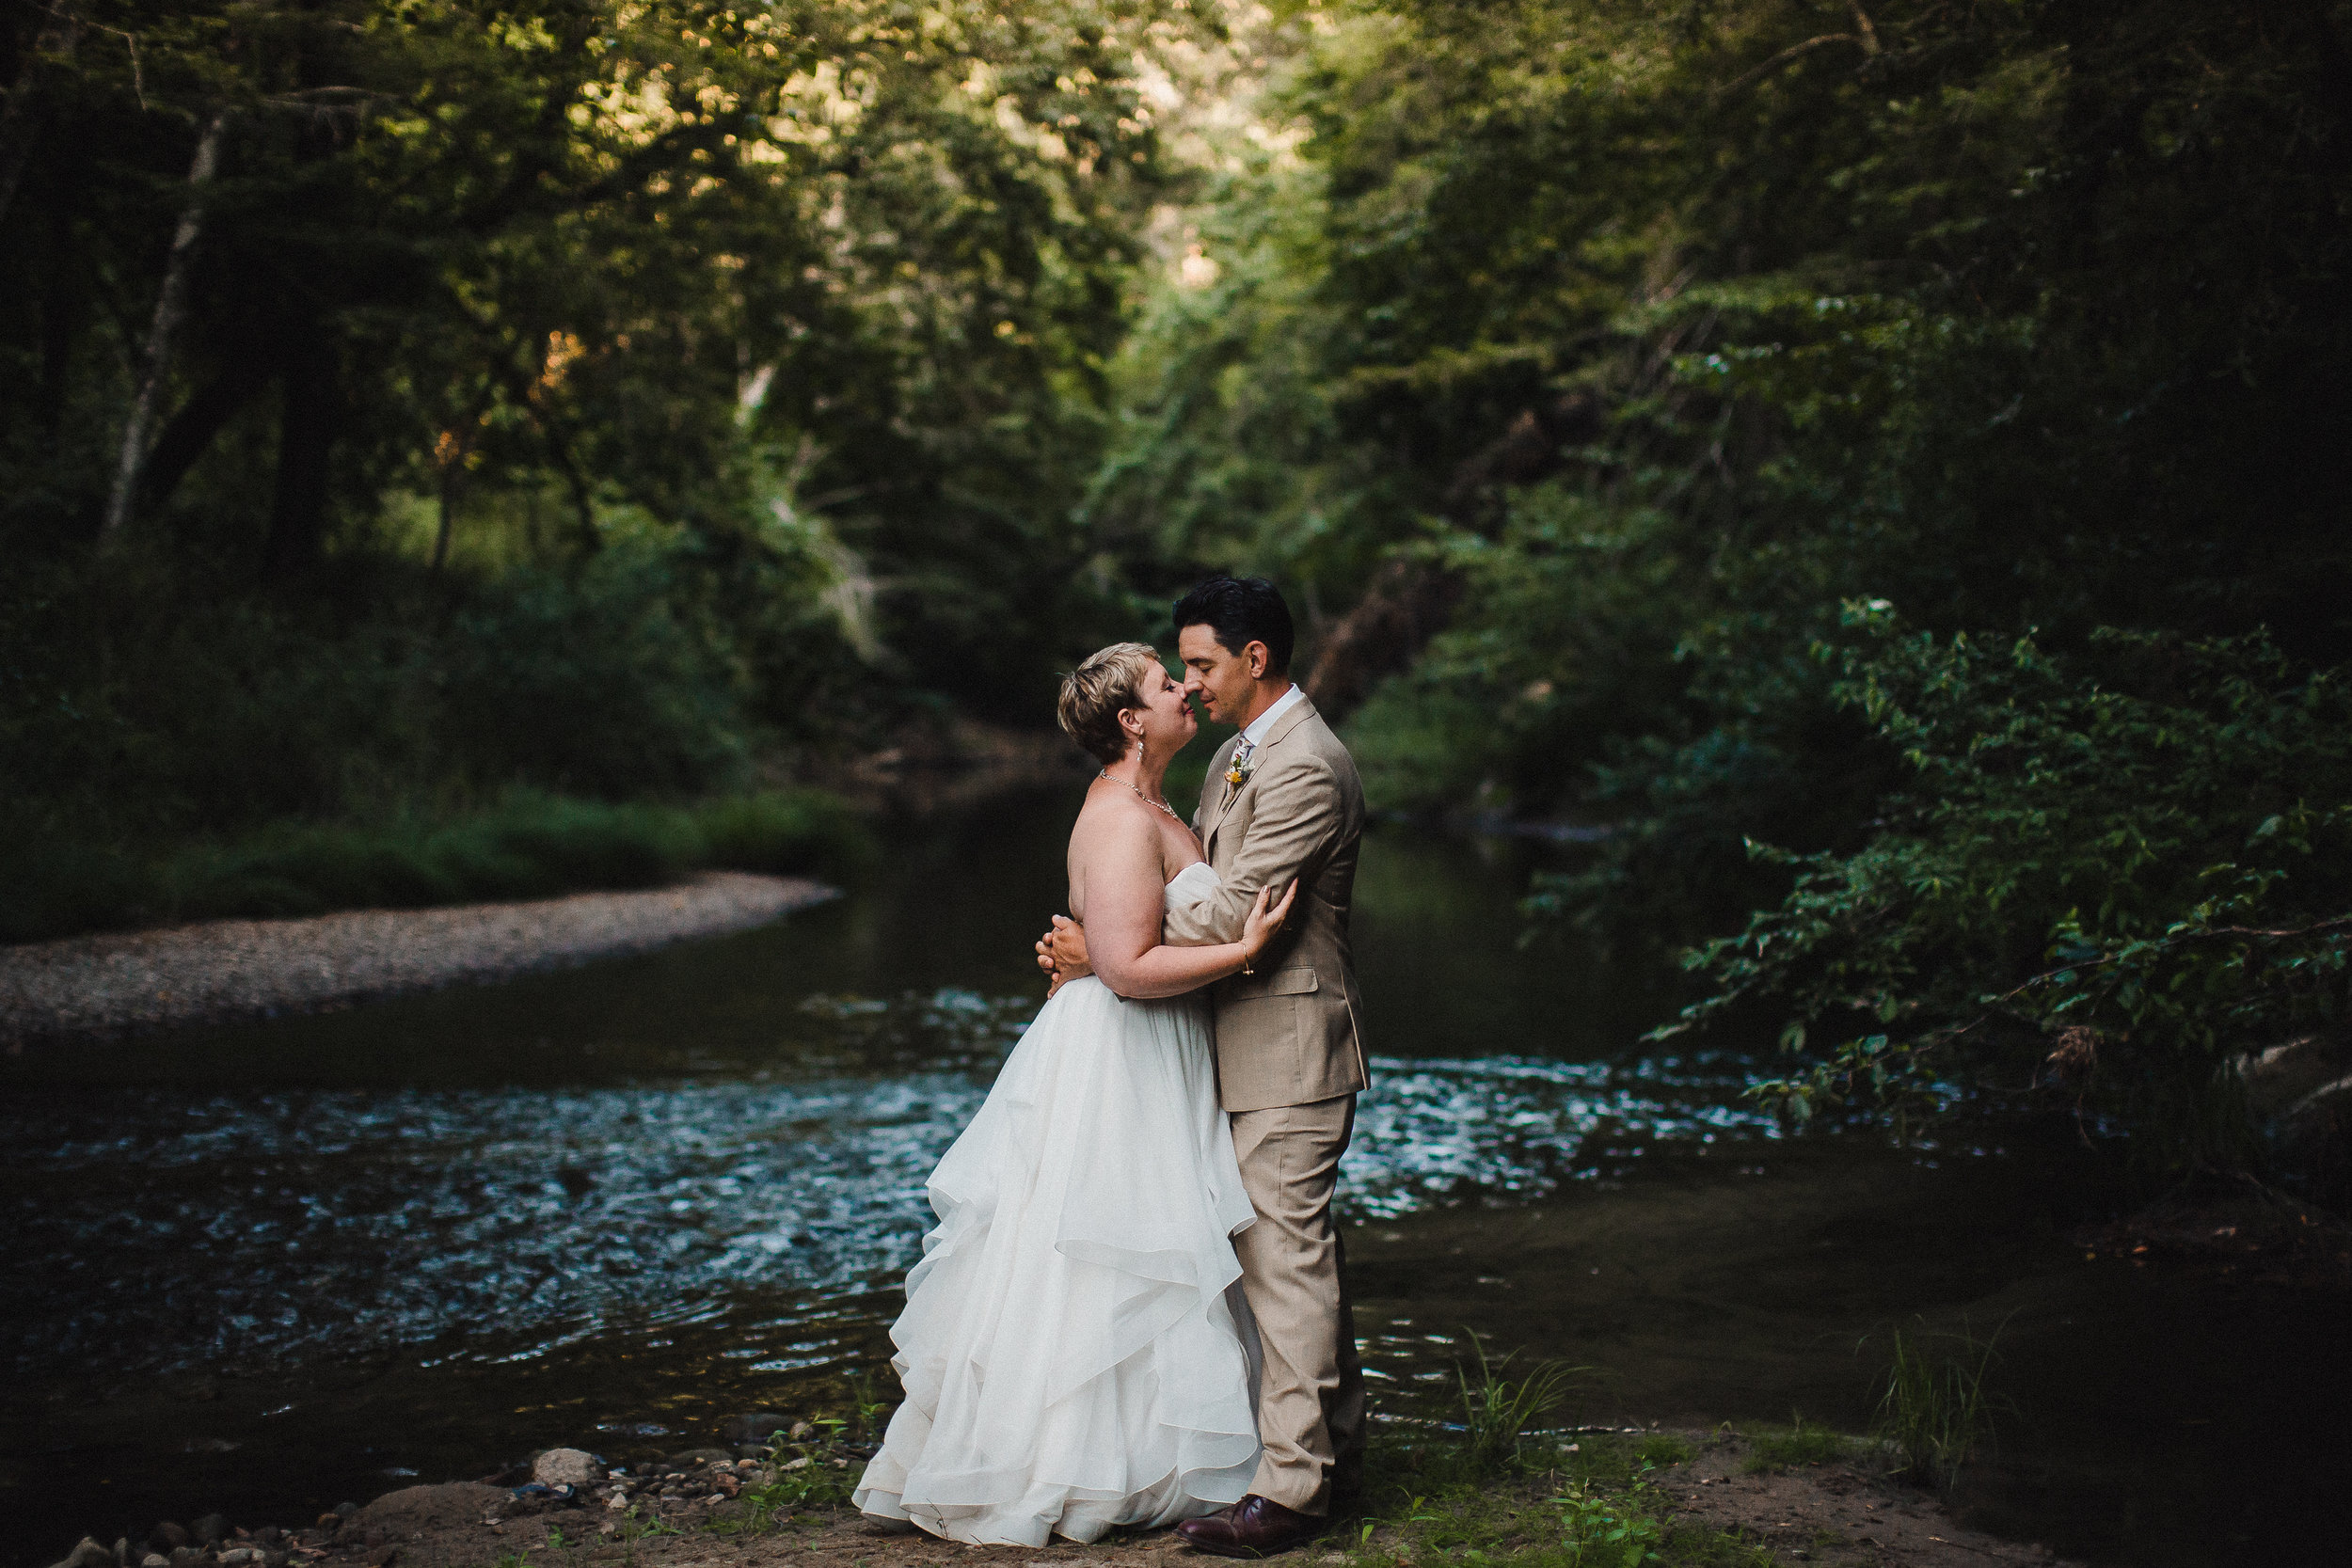 7. judith-kaydin-wedding-sunset-93.jpg